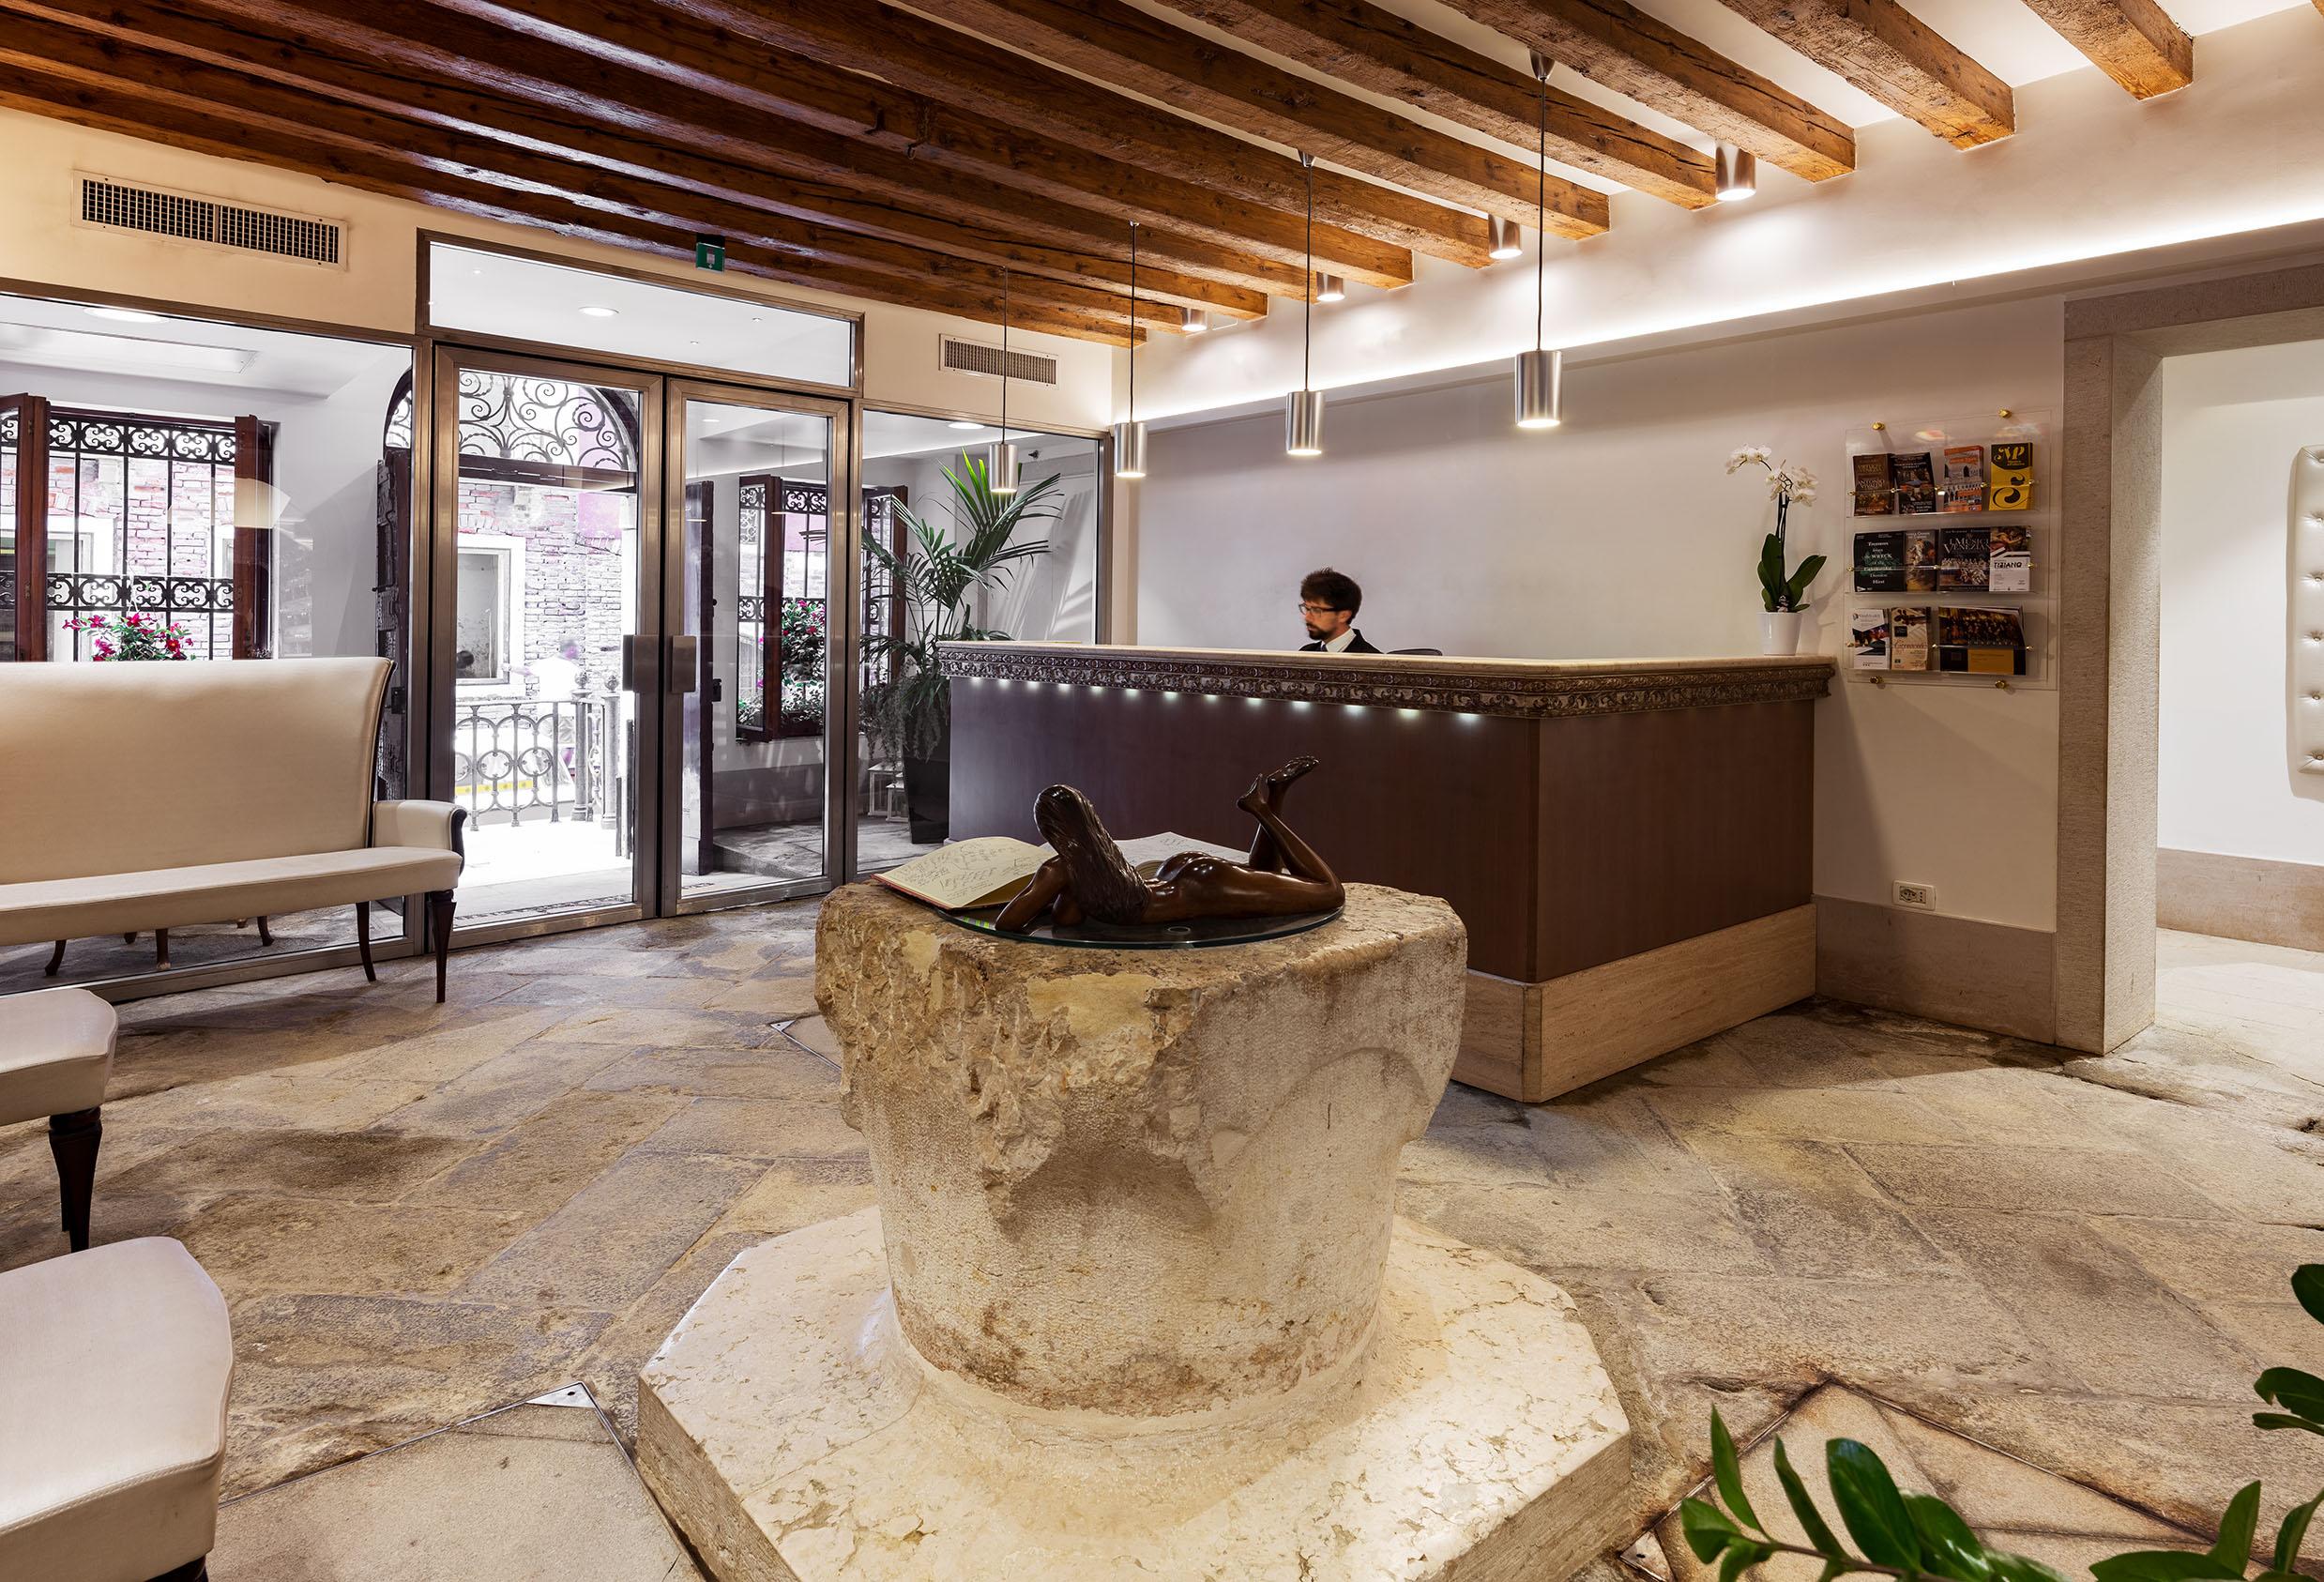 3 Sterne Hotel In Venedig Hotel Venedig Hotel Dell Opera Im Herzen